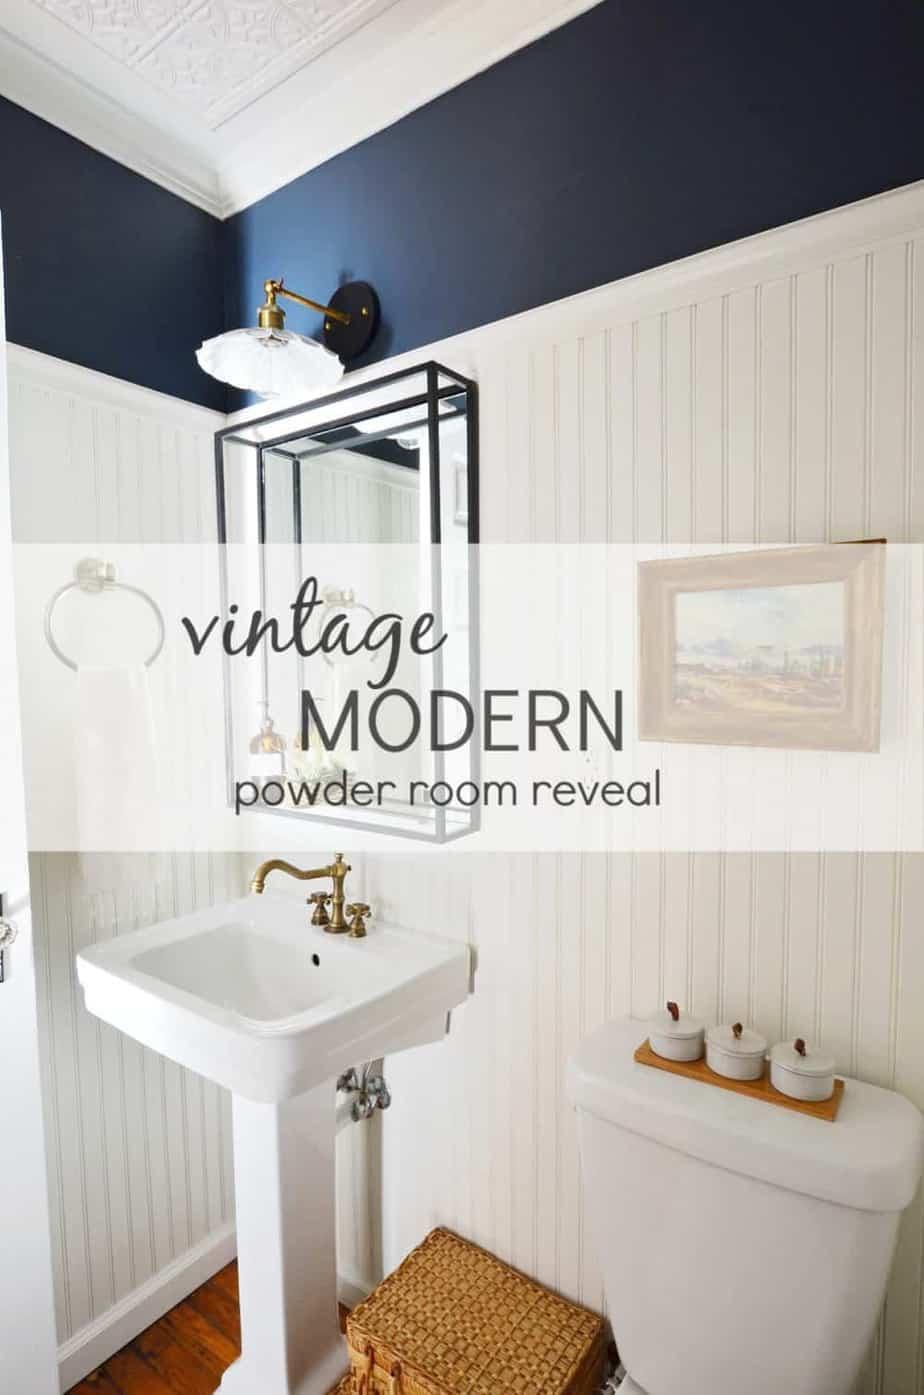 Vintage modern navy powder room reveal